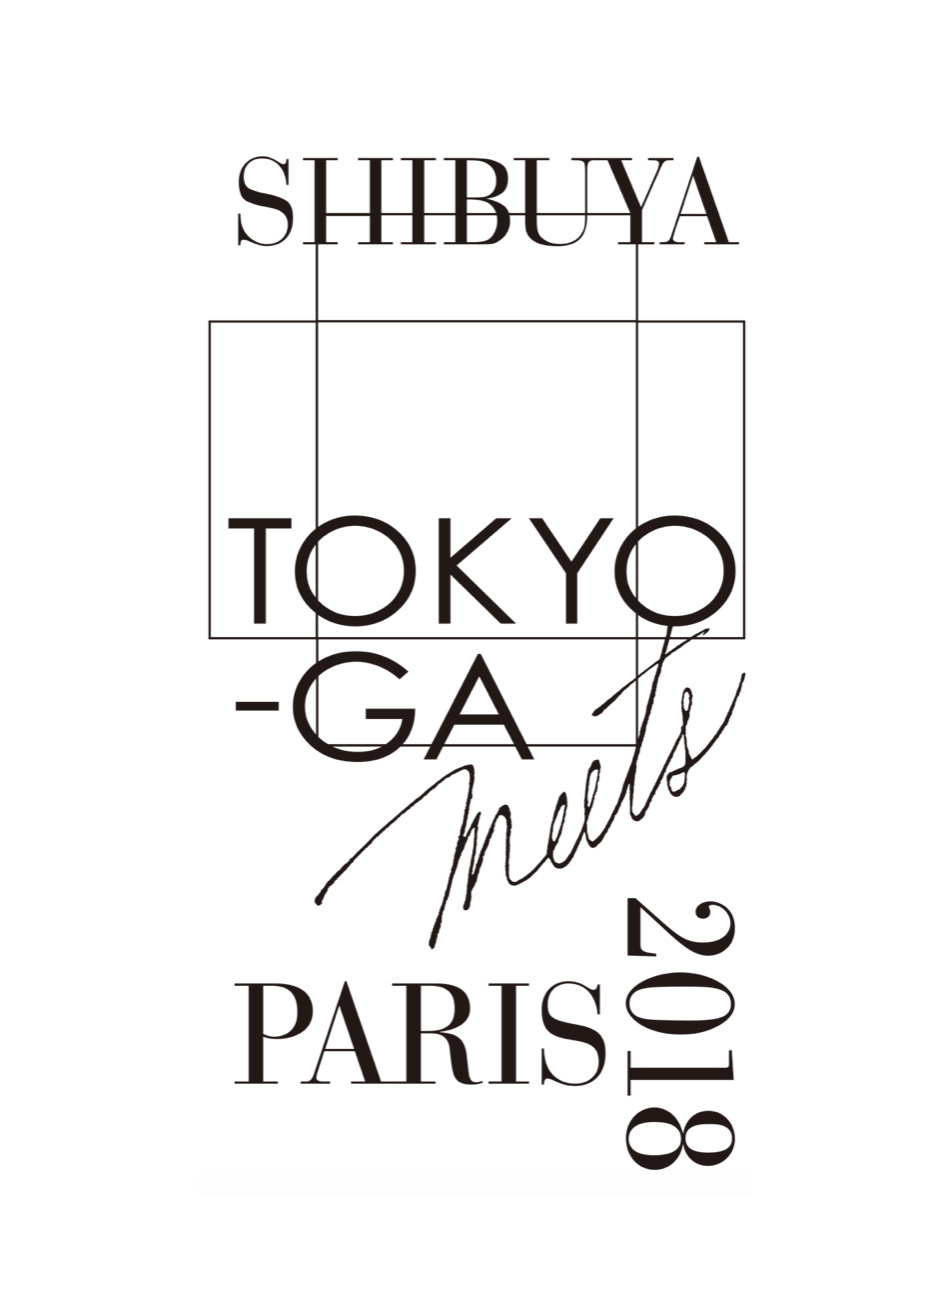 SHIBUYA-TOKYO CURIOSITY